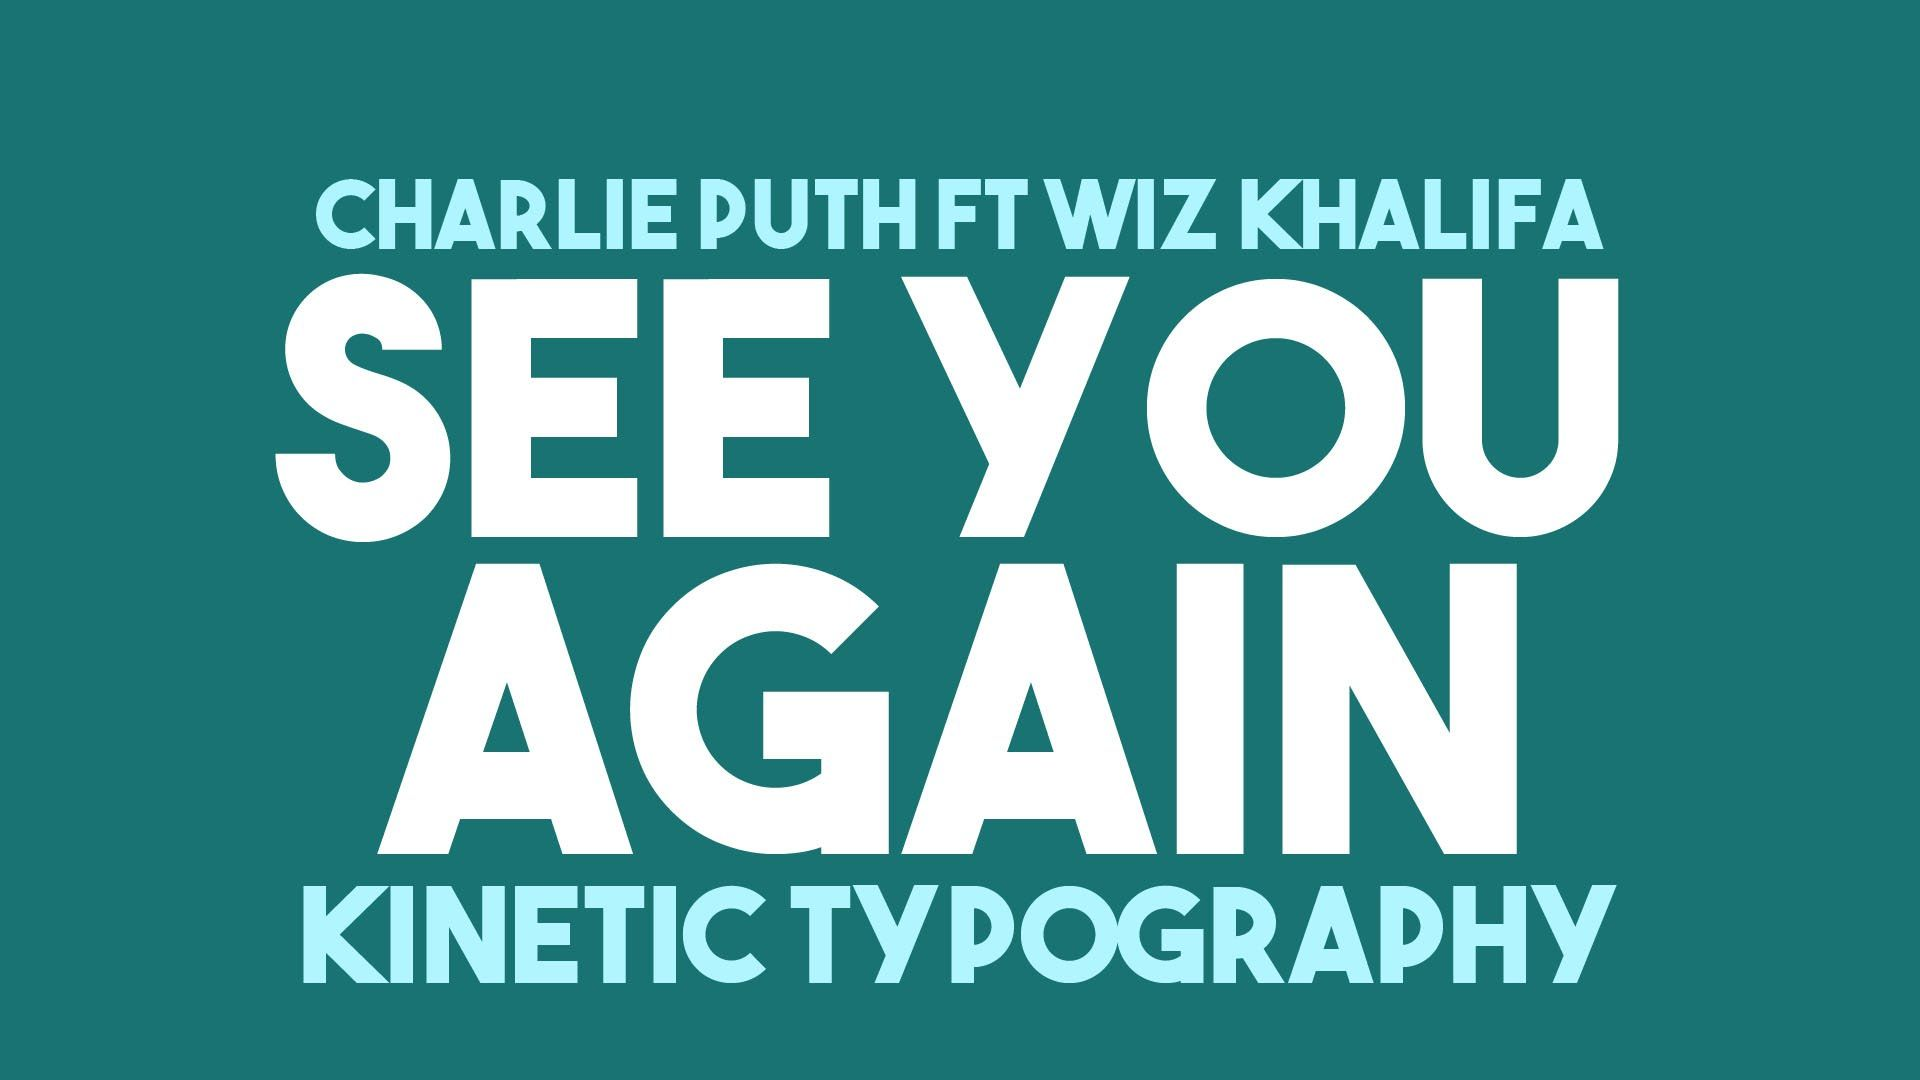 Wiz Khalifa See You Again Feat Charlie Puth - Lyrics (Kinetic Typography)